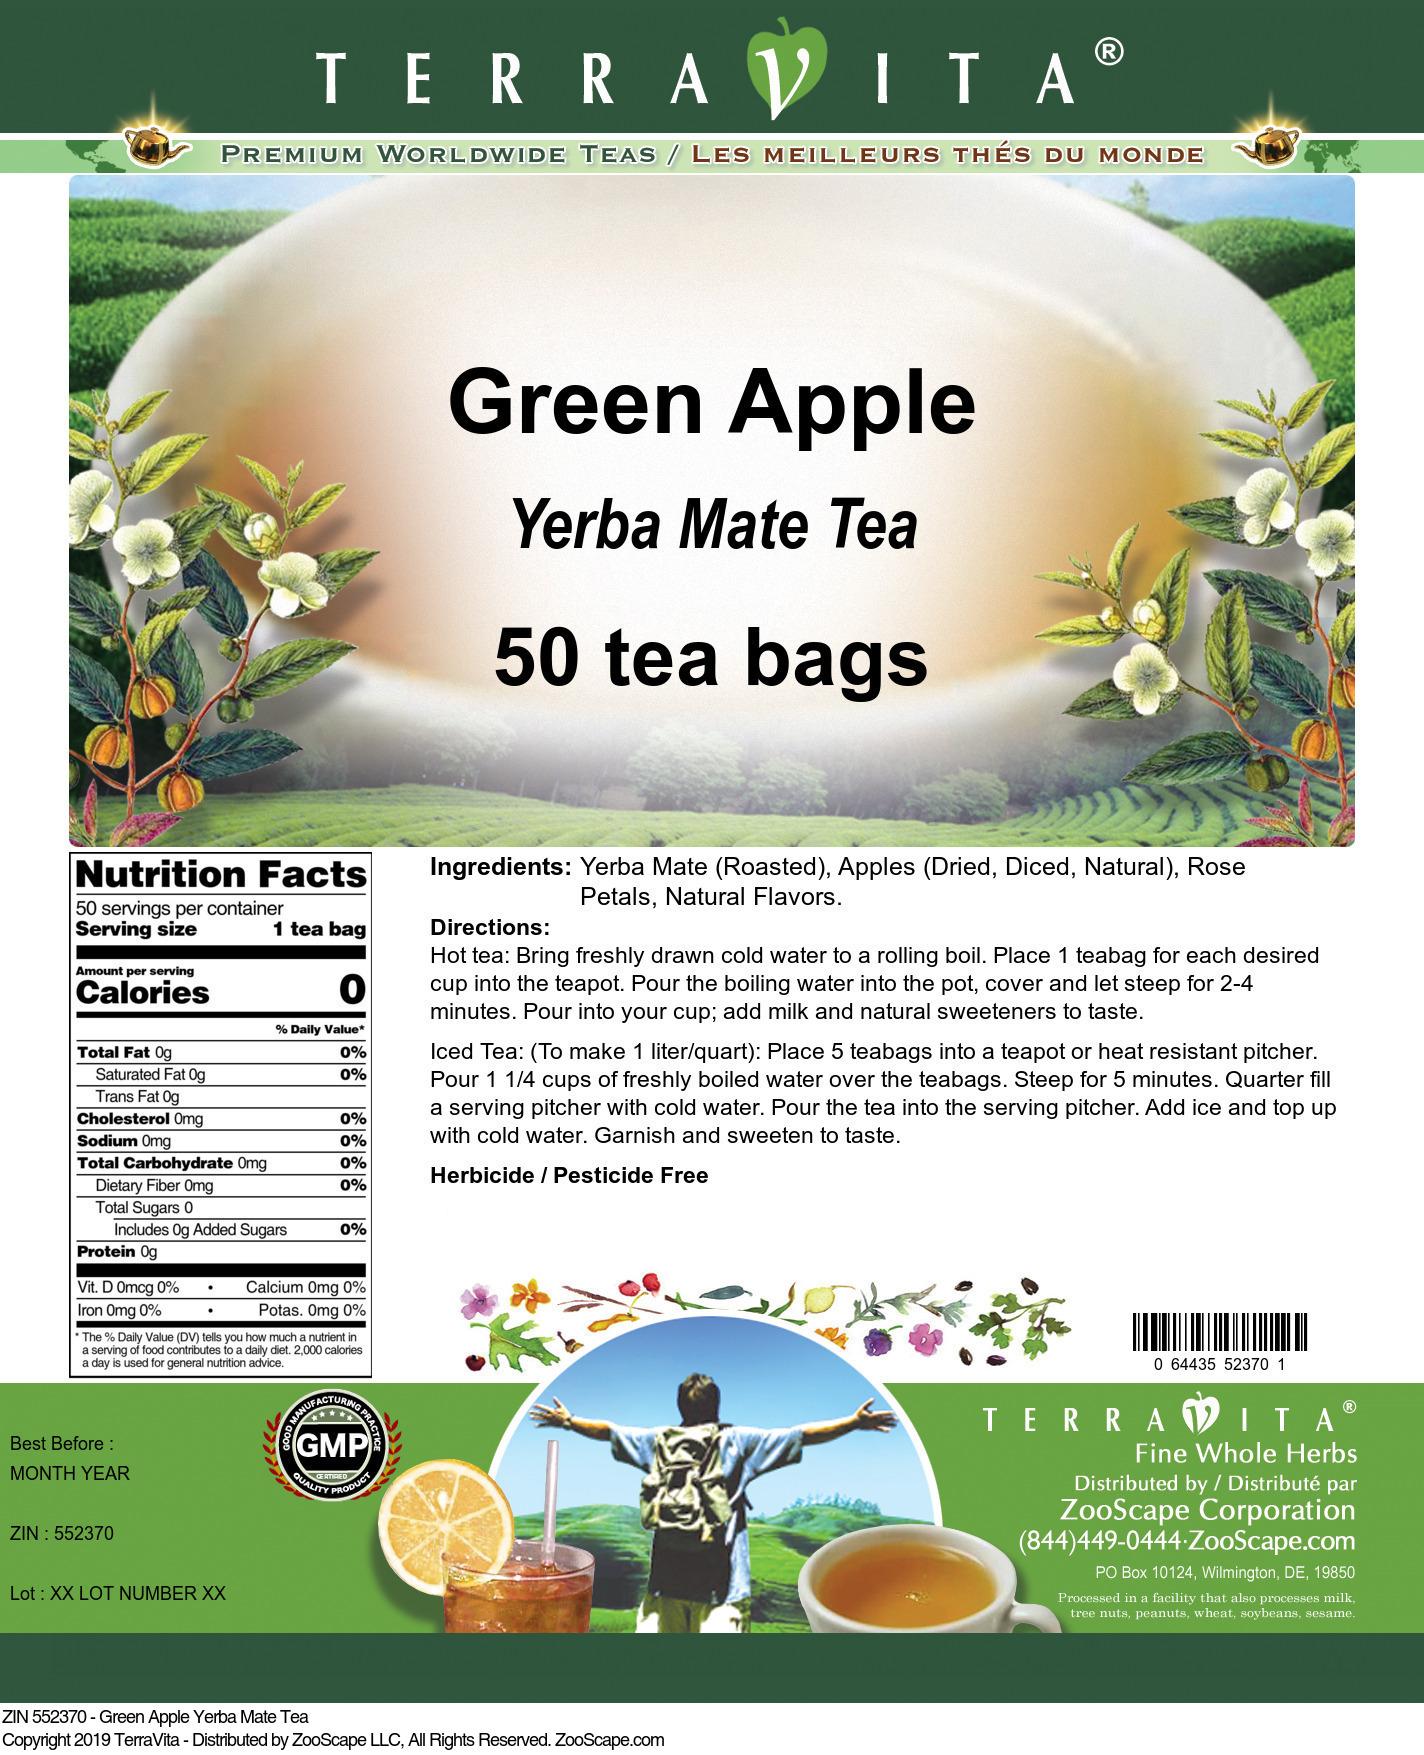 Green Apple Yerba Mate Tea